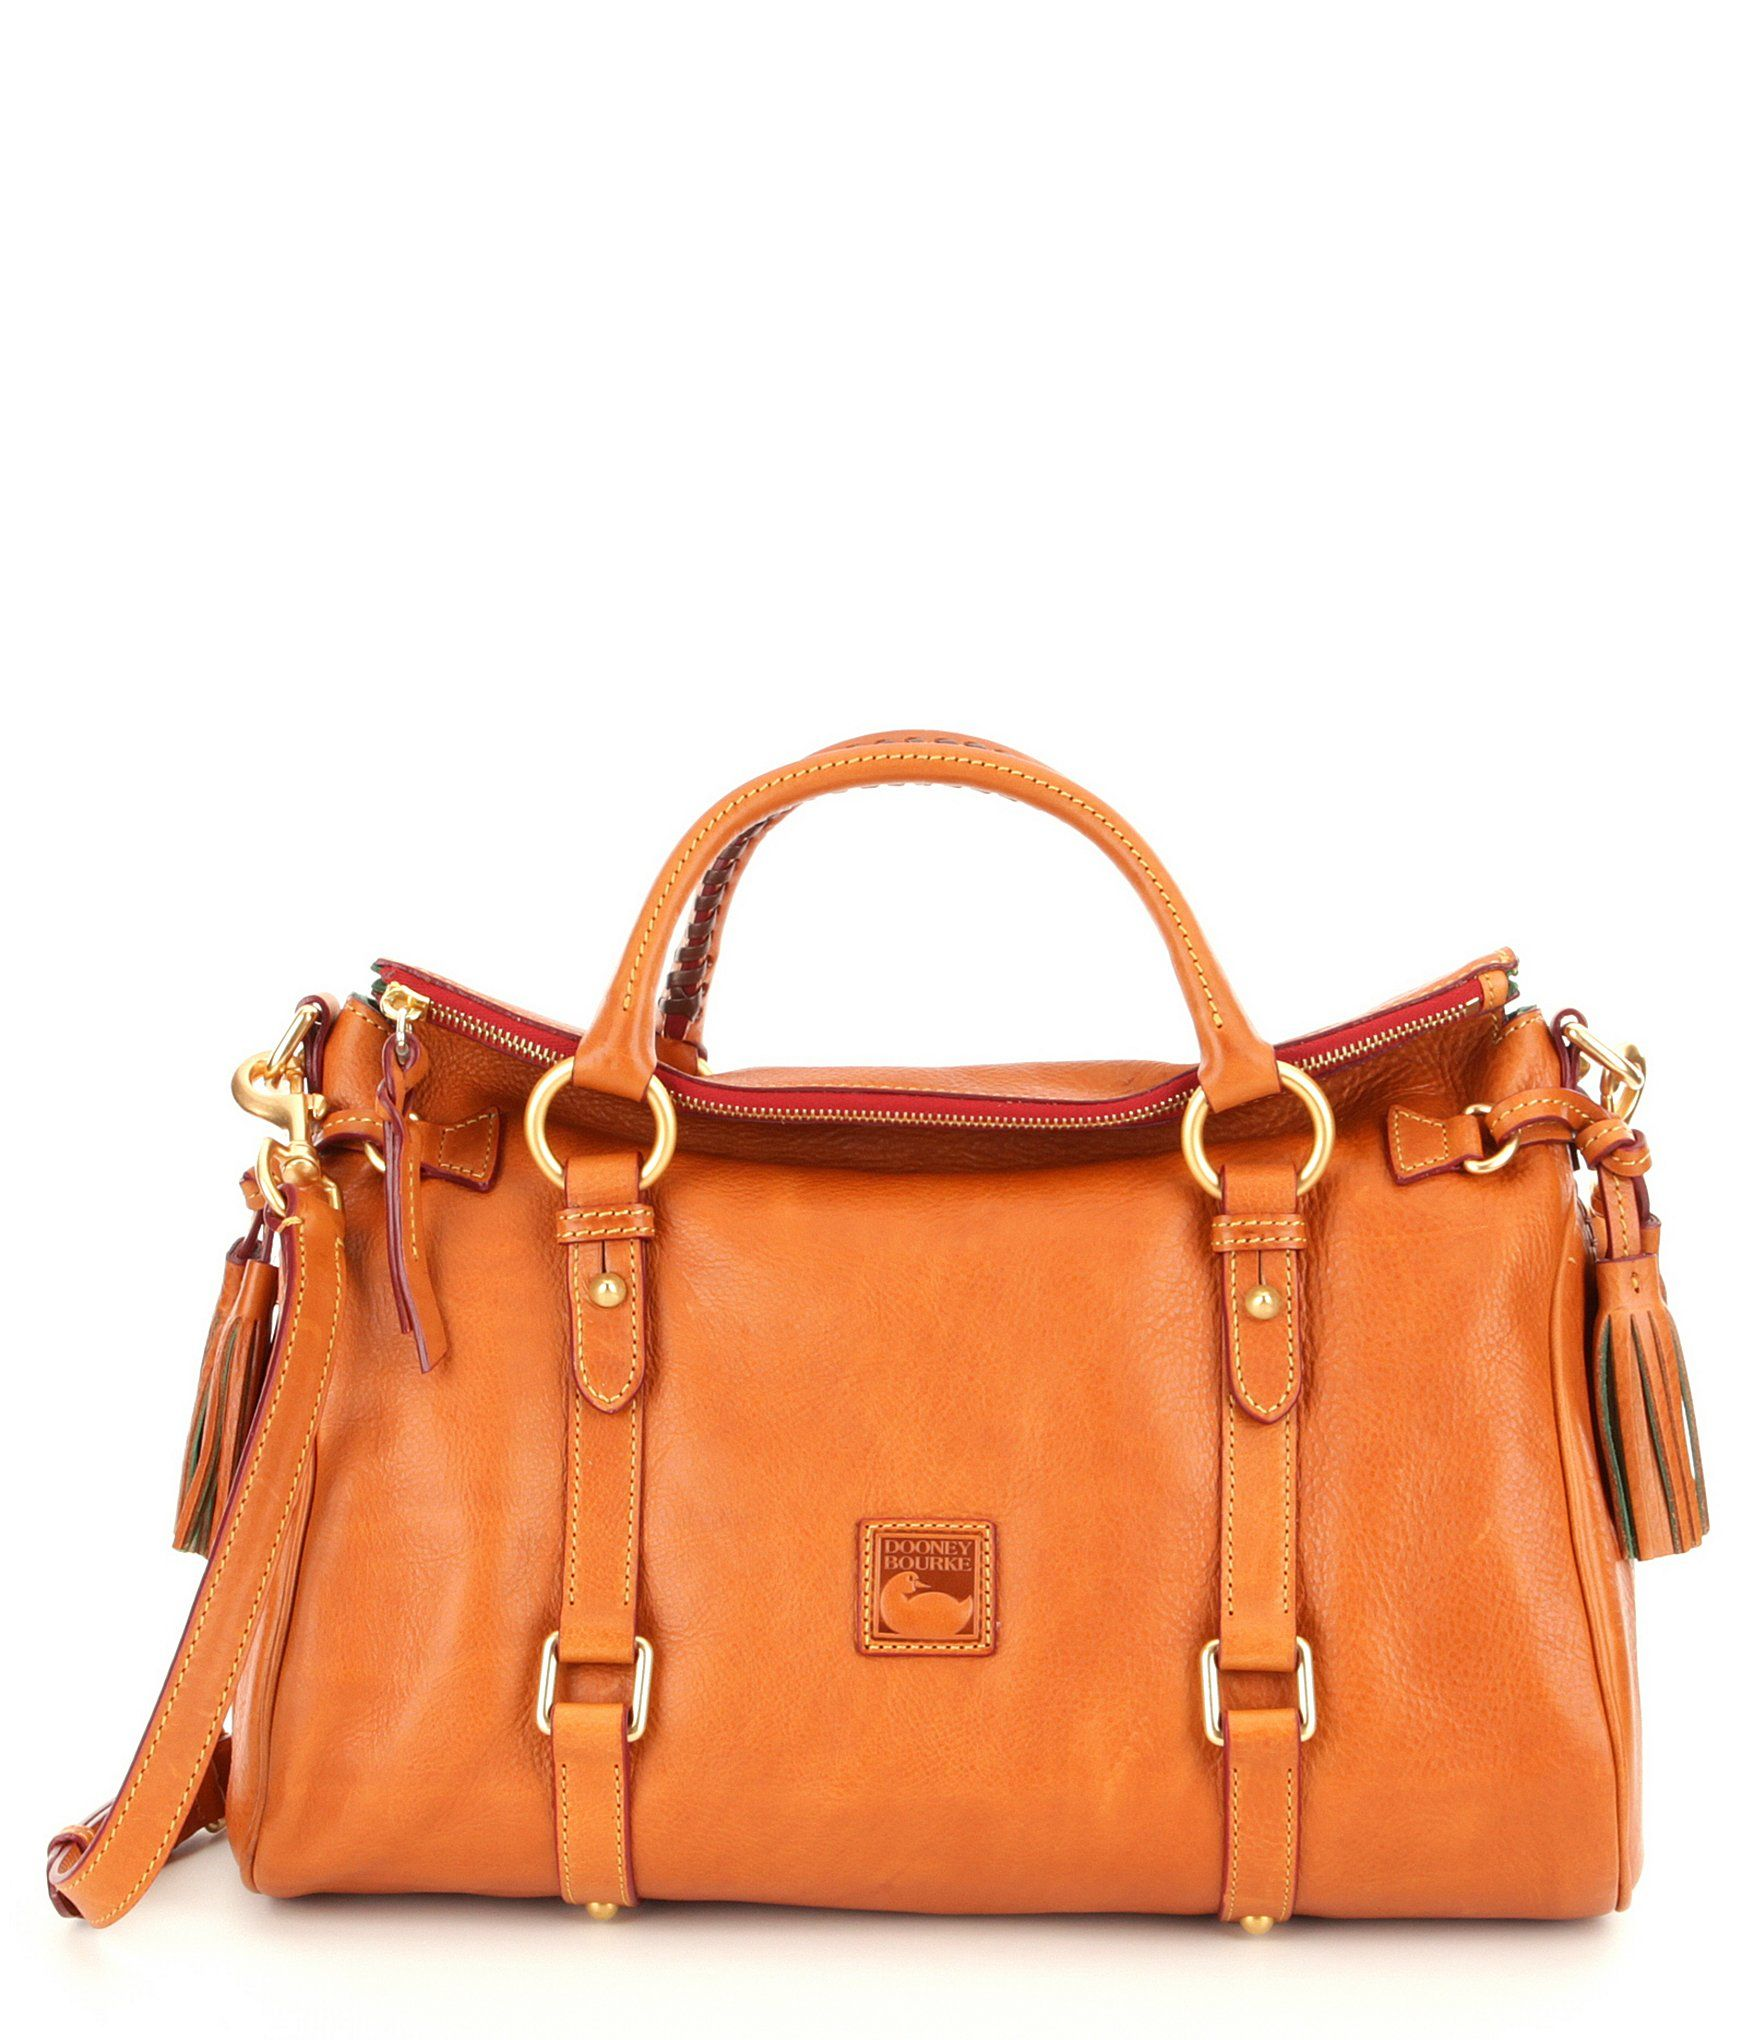 Dooney & Bourke Florentine Leather Tasseled Satchel Bag